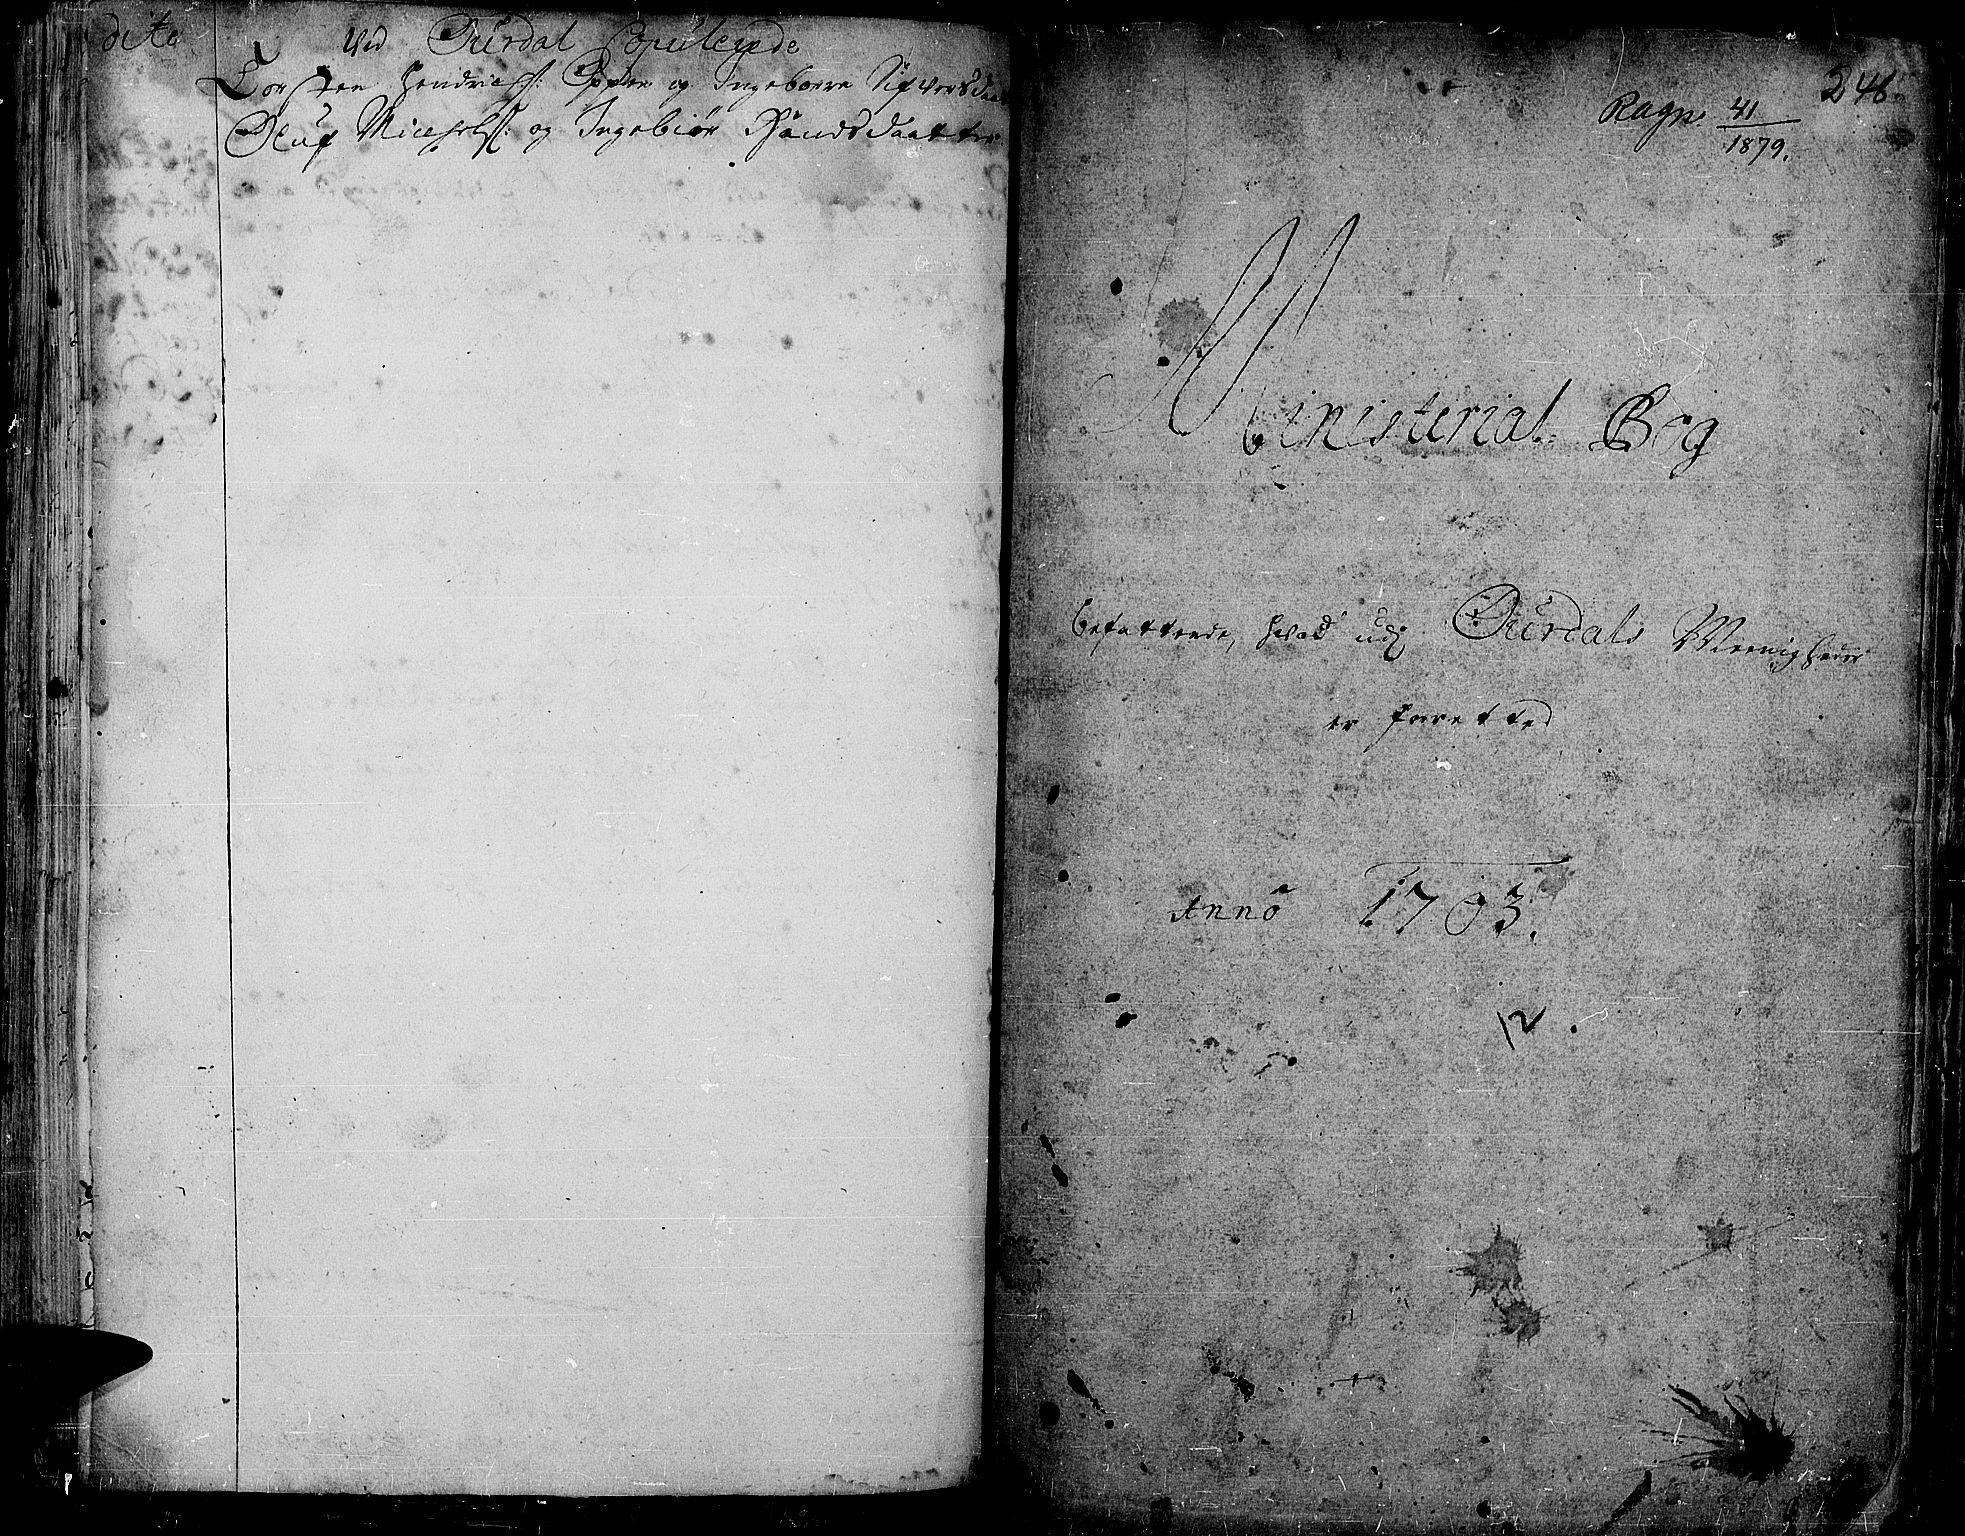 SAH, Aurdal prestekontor, Ministerialbok nr. 1-3, 1692-1730, s. 248